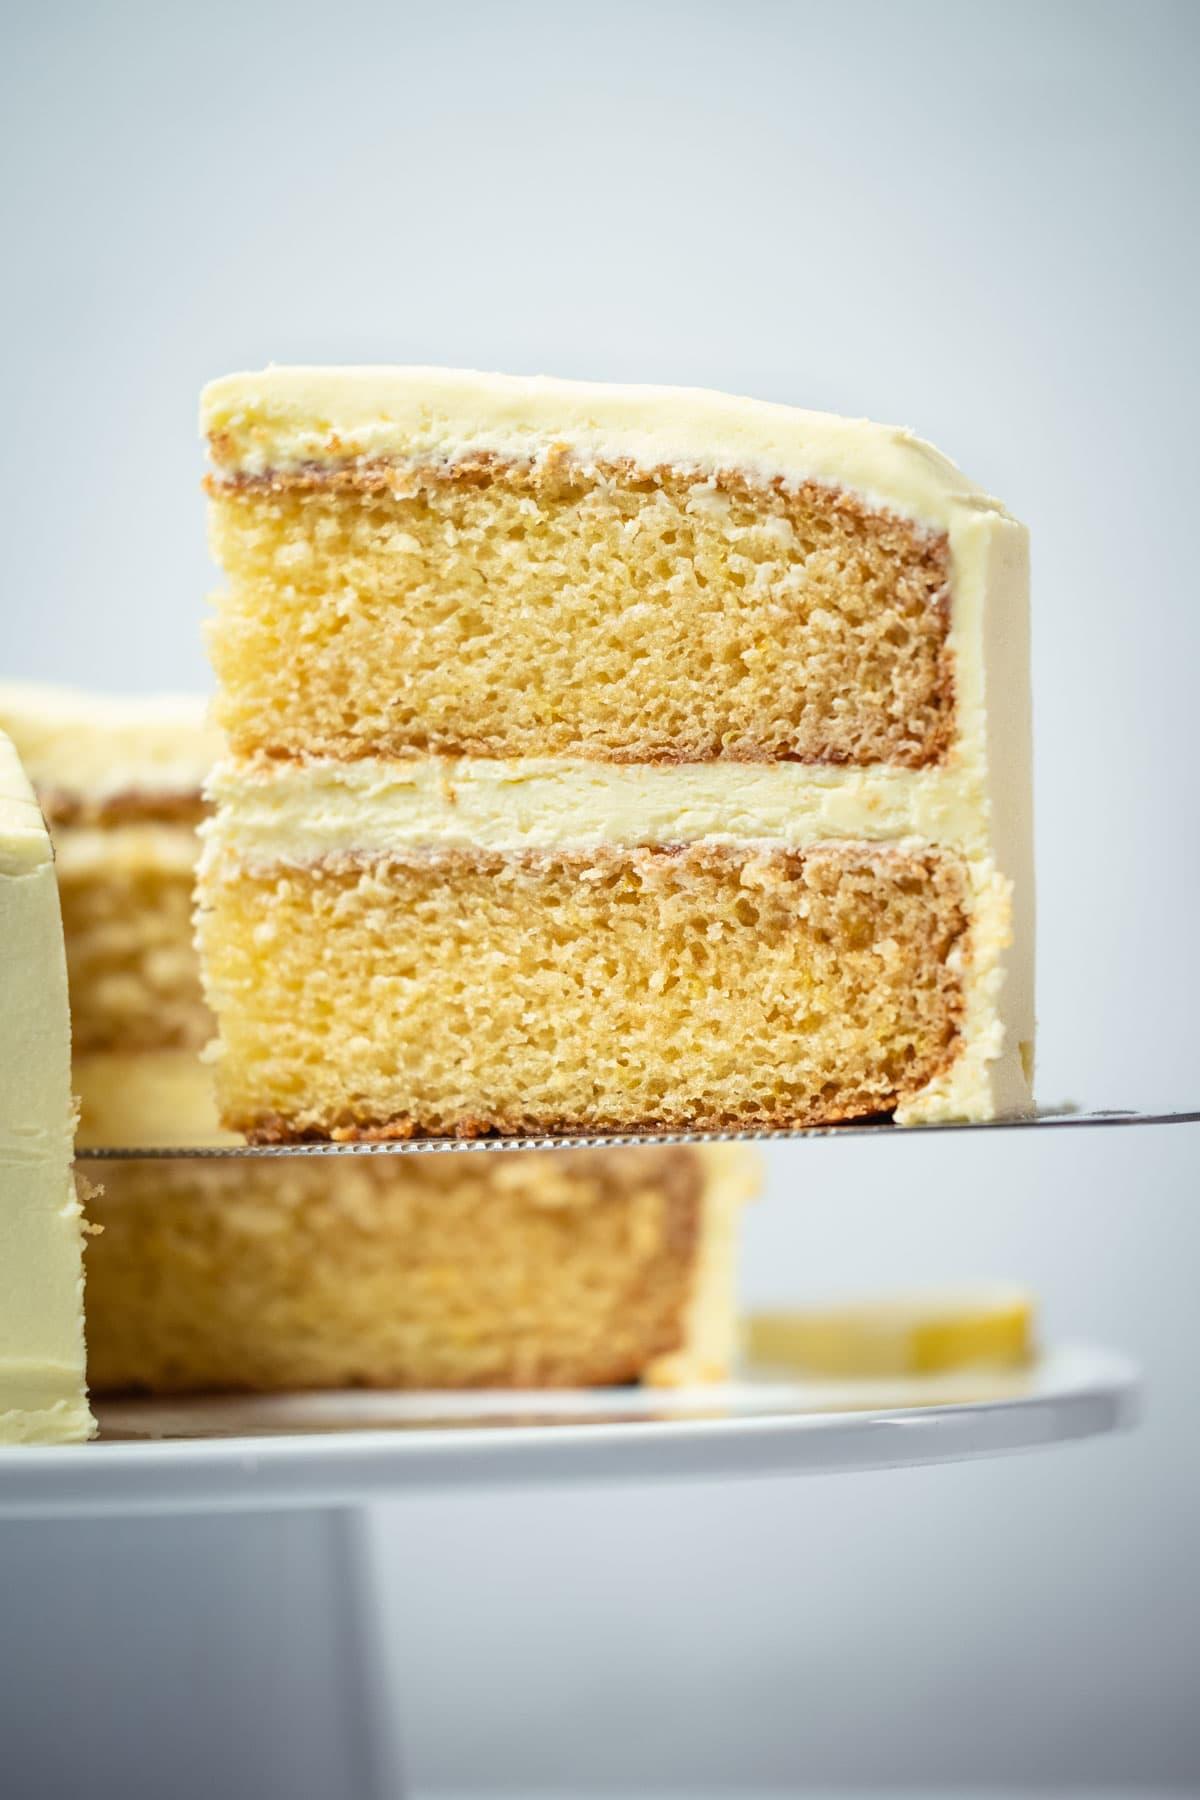 Slice of eggless lemon cake on a cake lifter.